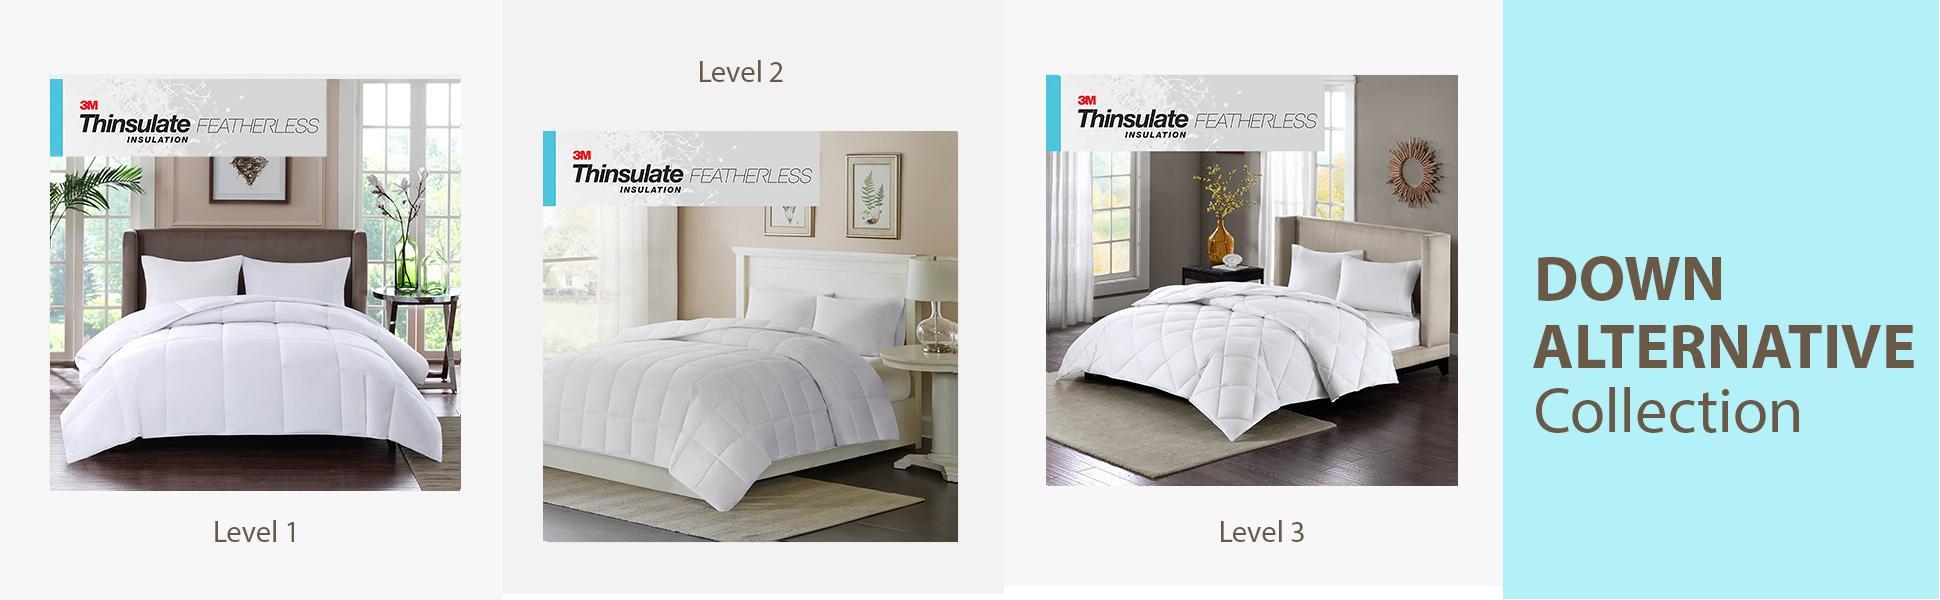 Amazon.com: Sleep Philosophy Level 3: Warmest 3M Thinsulate Down ...